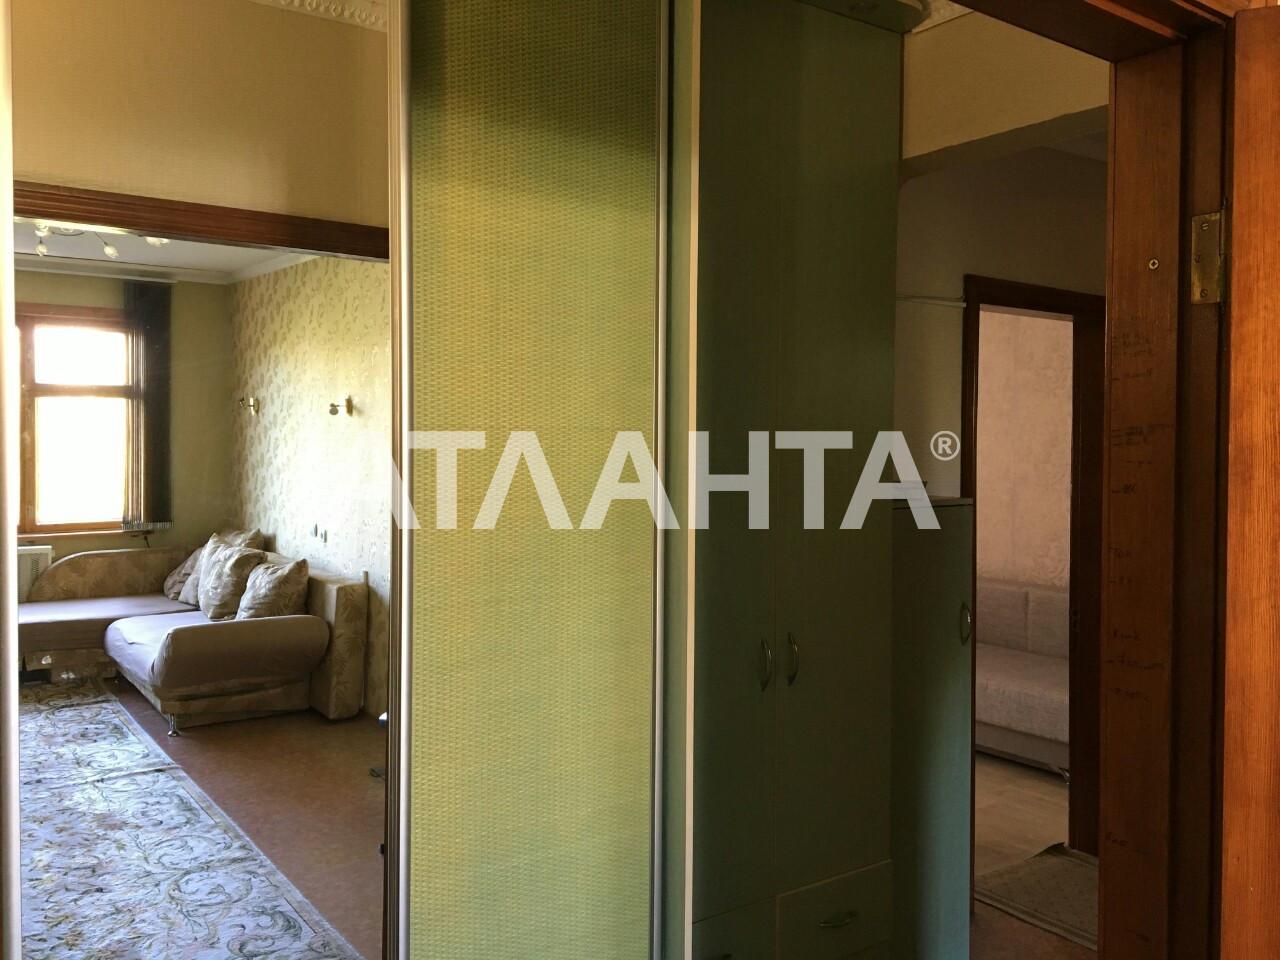 Продается 3-комнатная Квартира на ул. Архитекторская — 49 000 у.е. (фото №3)